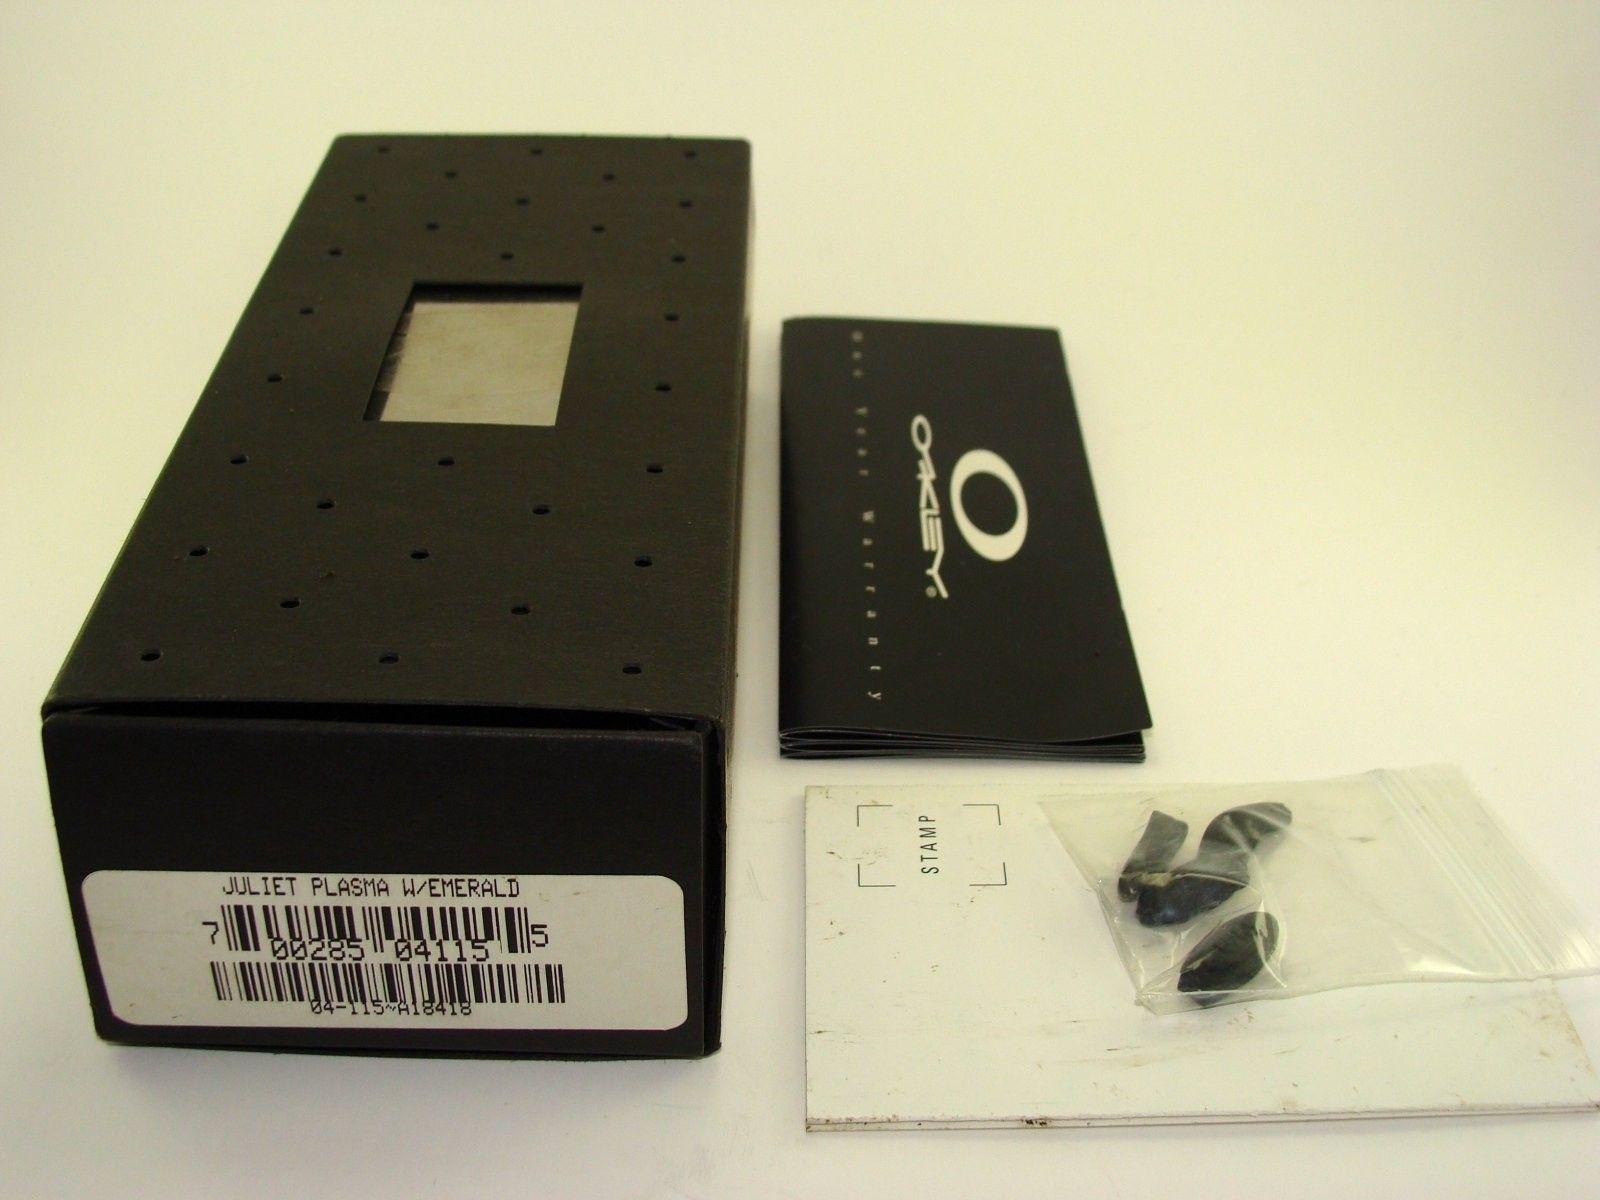 1st Gen Juliet Plasma Emerald 04-115 $400 Shipped CONUS - Oakley Emerald Juliet02.jpg